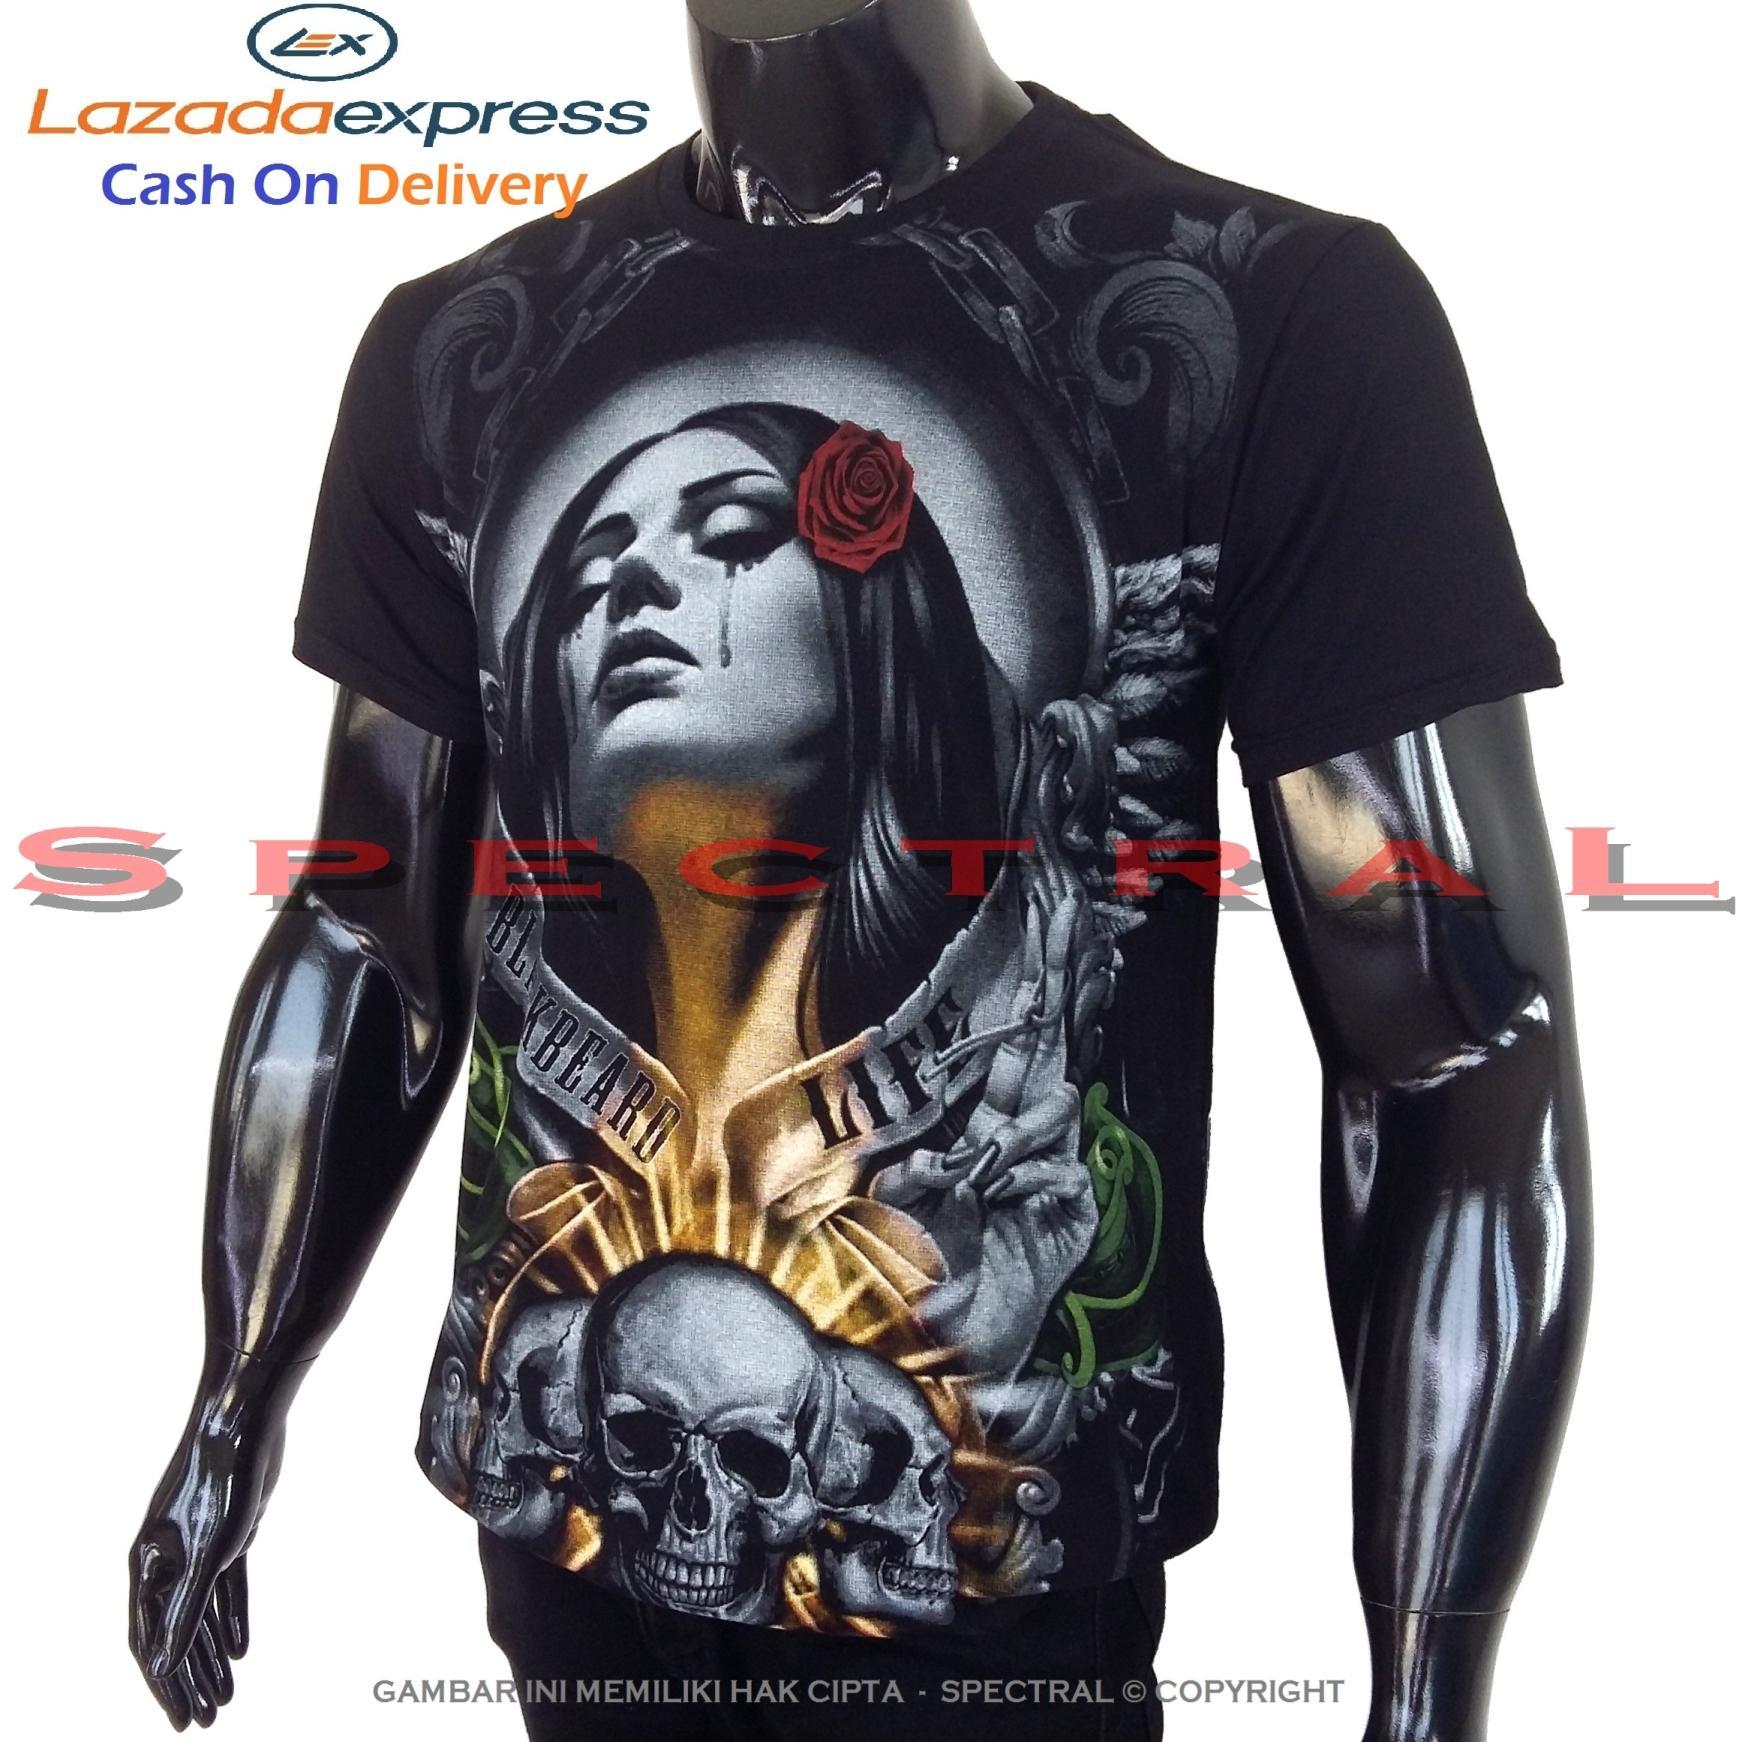 Spectral – WANITA DOA 100% Cotton Combed 30s Kaos Distro Fashion T-Shirt Atasan Terbaru Baju Pakaian Polos Pria Wanita Cewe Cowo Lengan Murah Bagus Keren Jaman Kekinian Jakarta Bandung Gambar Animasi Lukisan Seni Kegelapan Horor Seram Sexy Setan Gaib